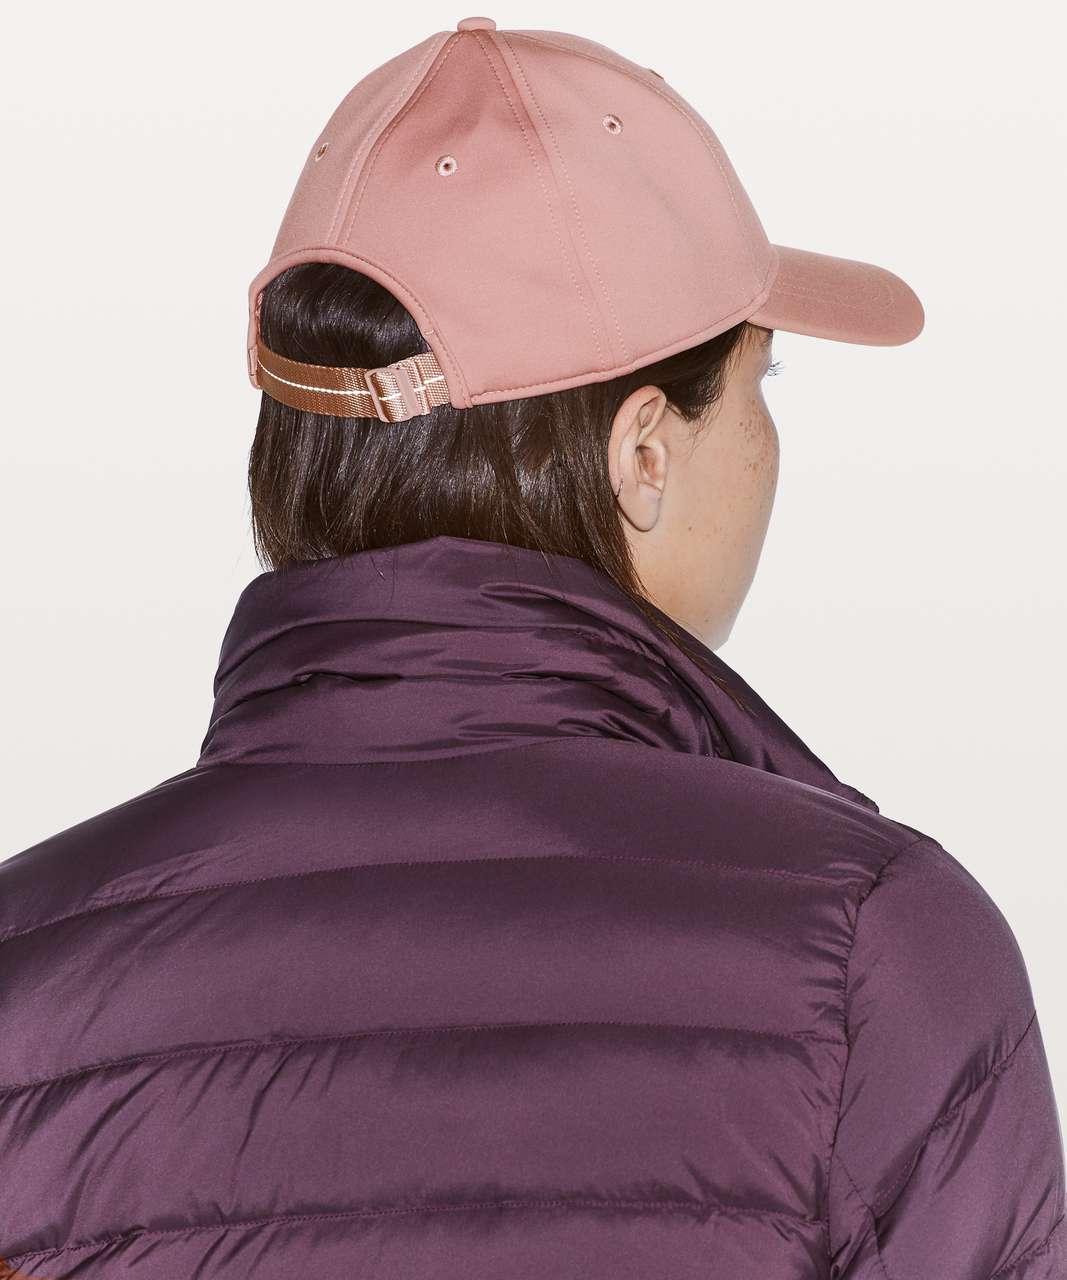 Lululemon Baller Hat - Light Quicksand